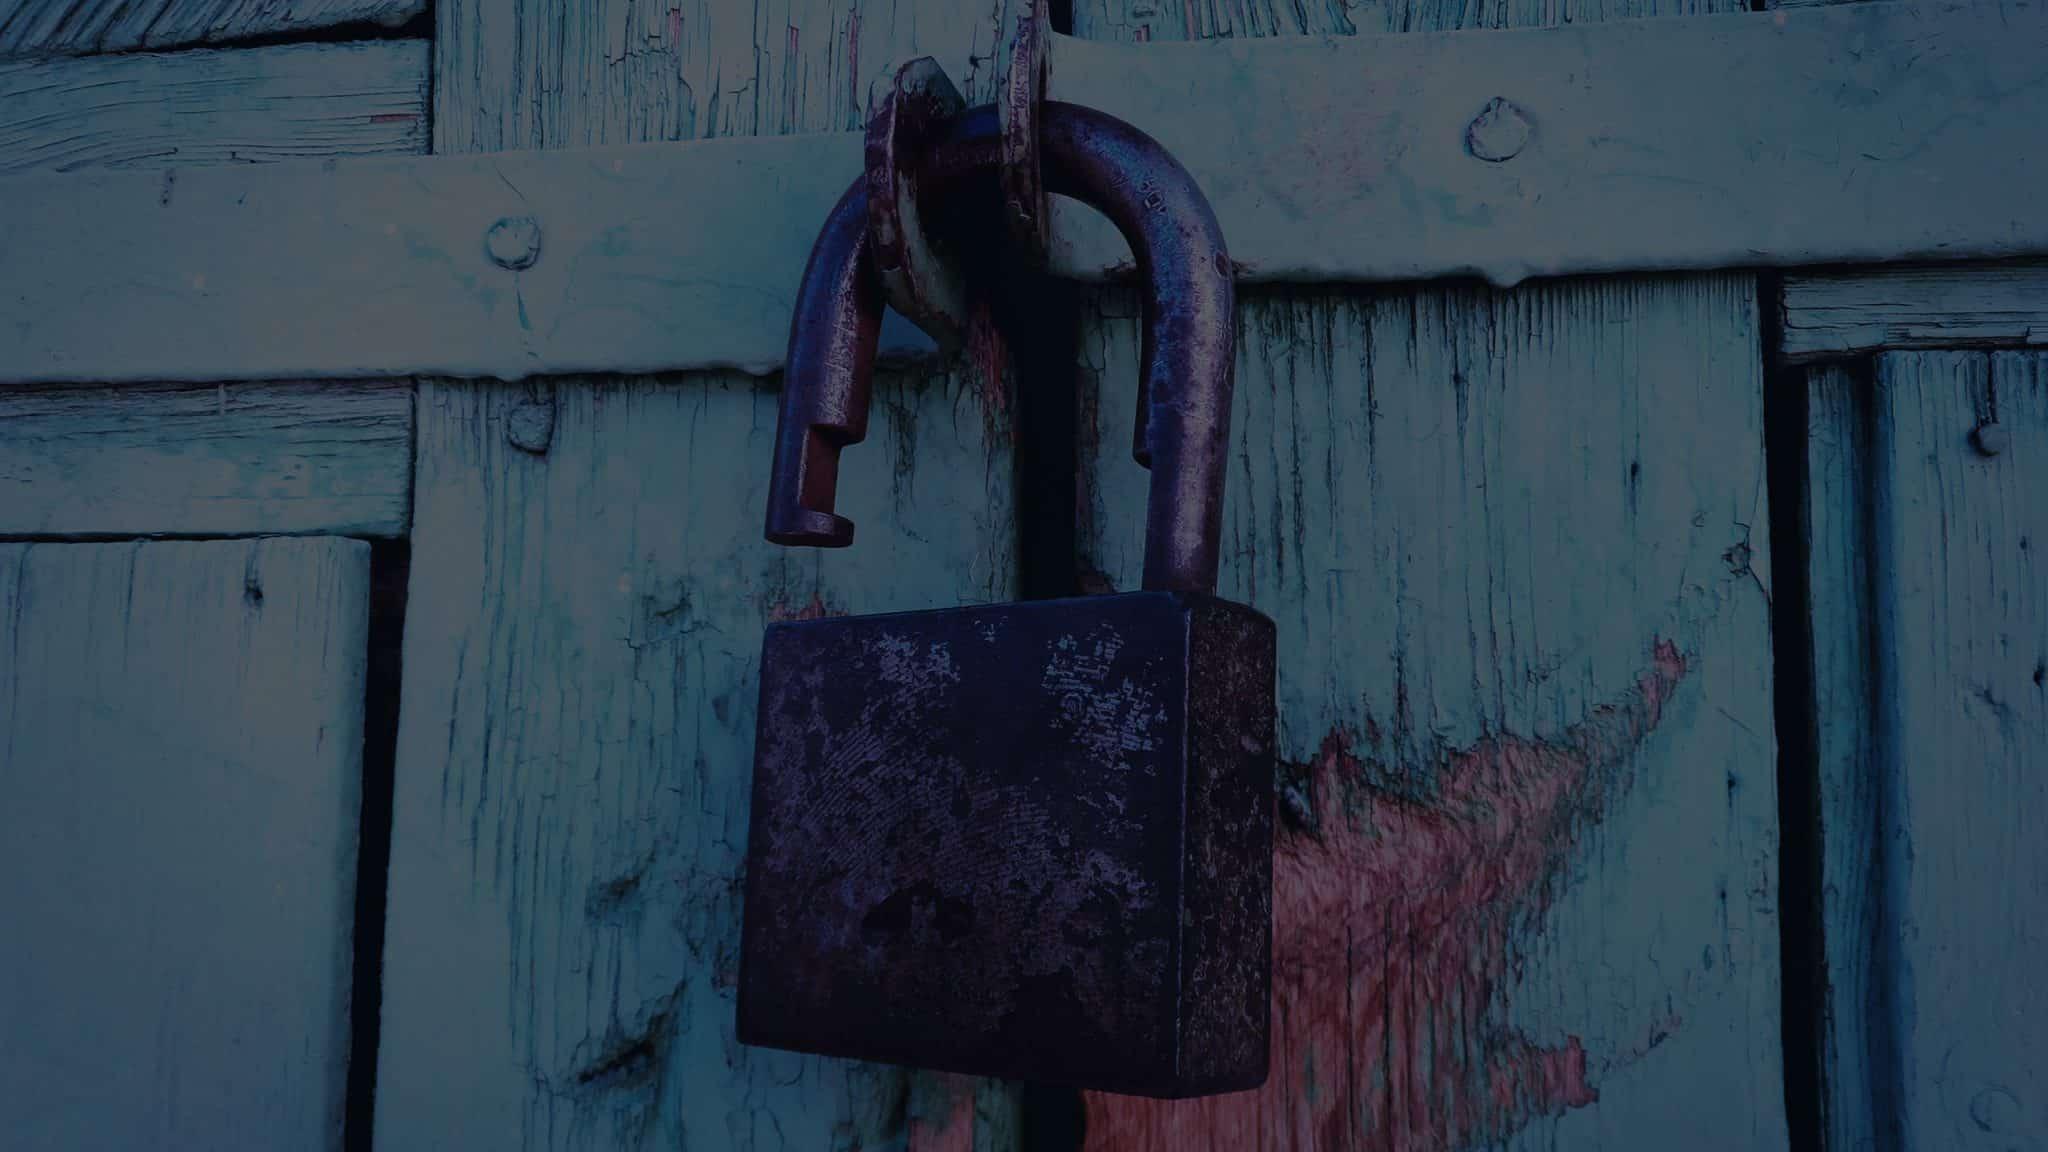 open lock, lack of security